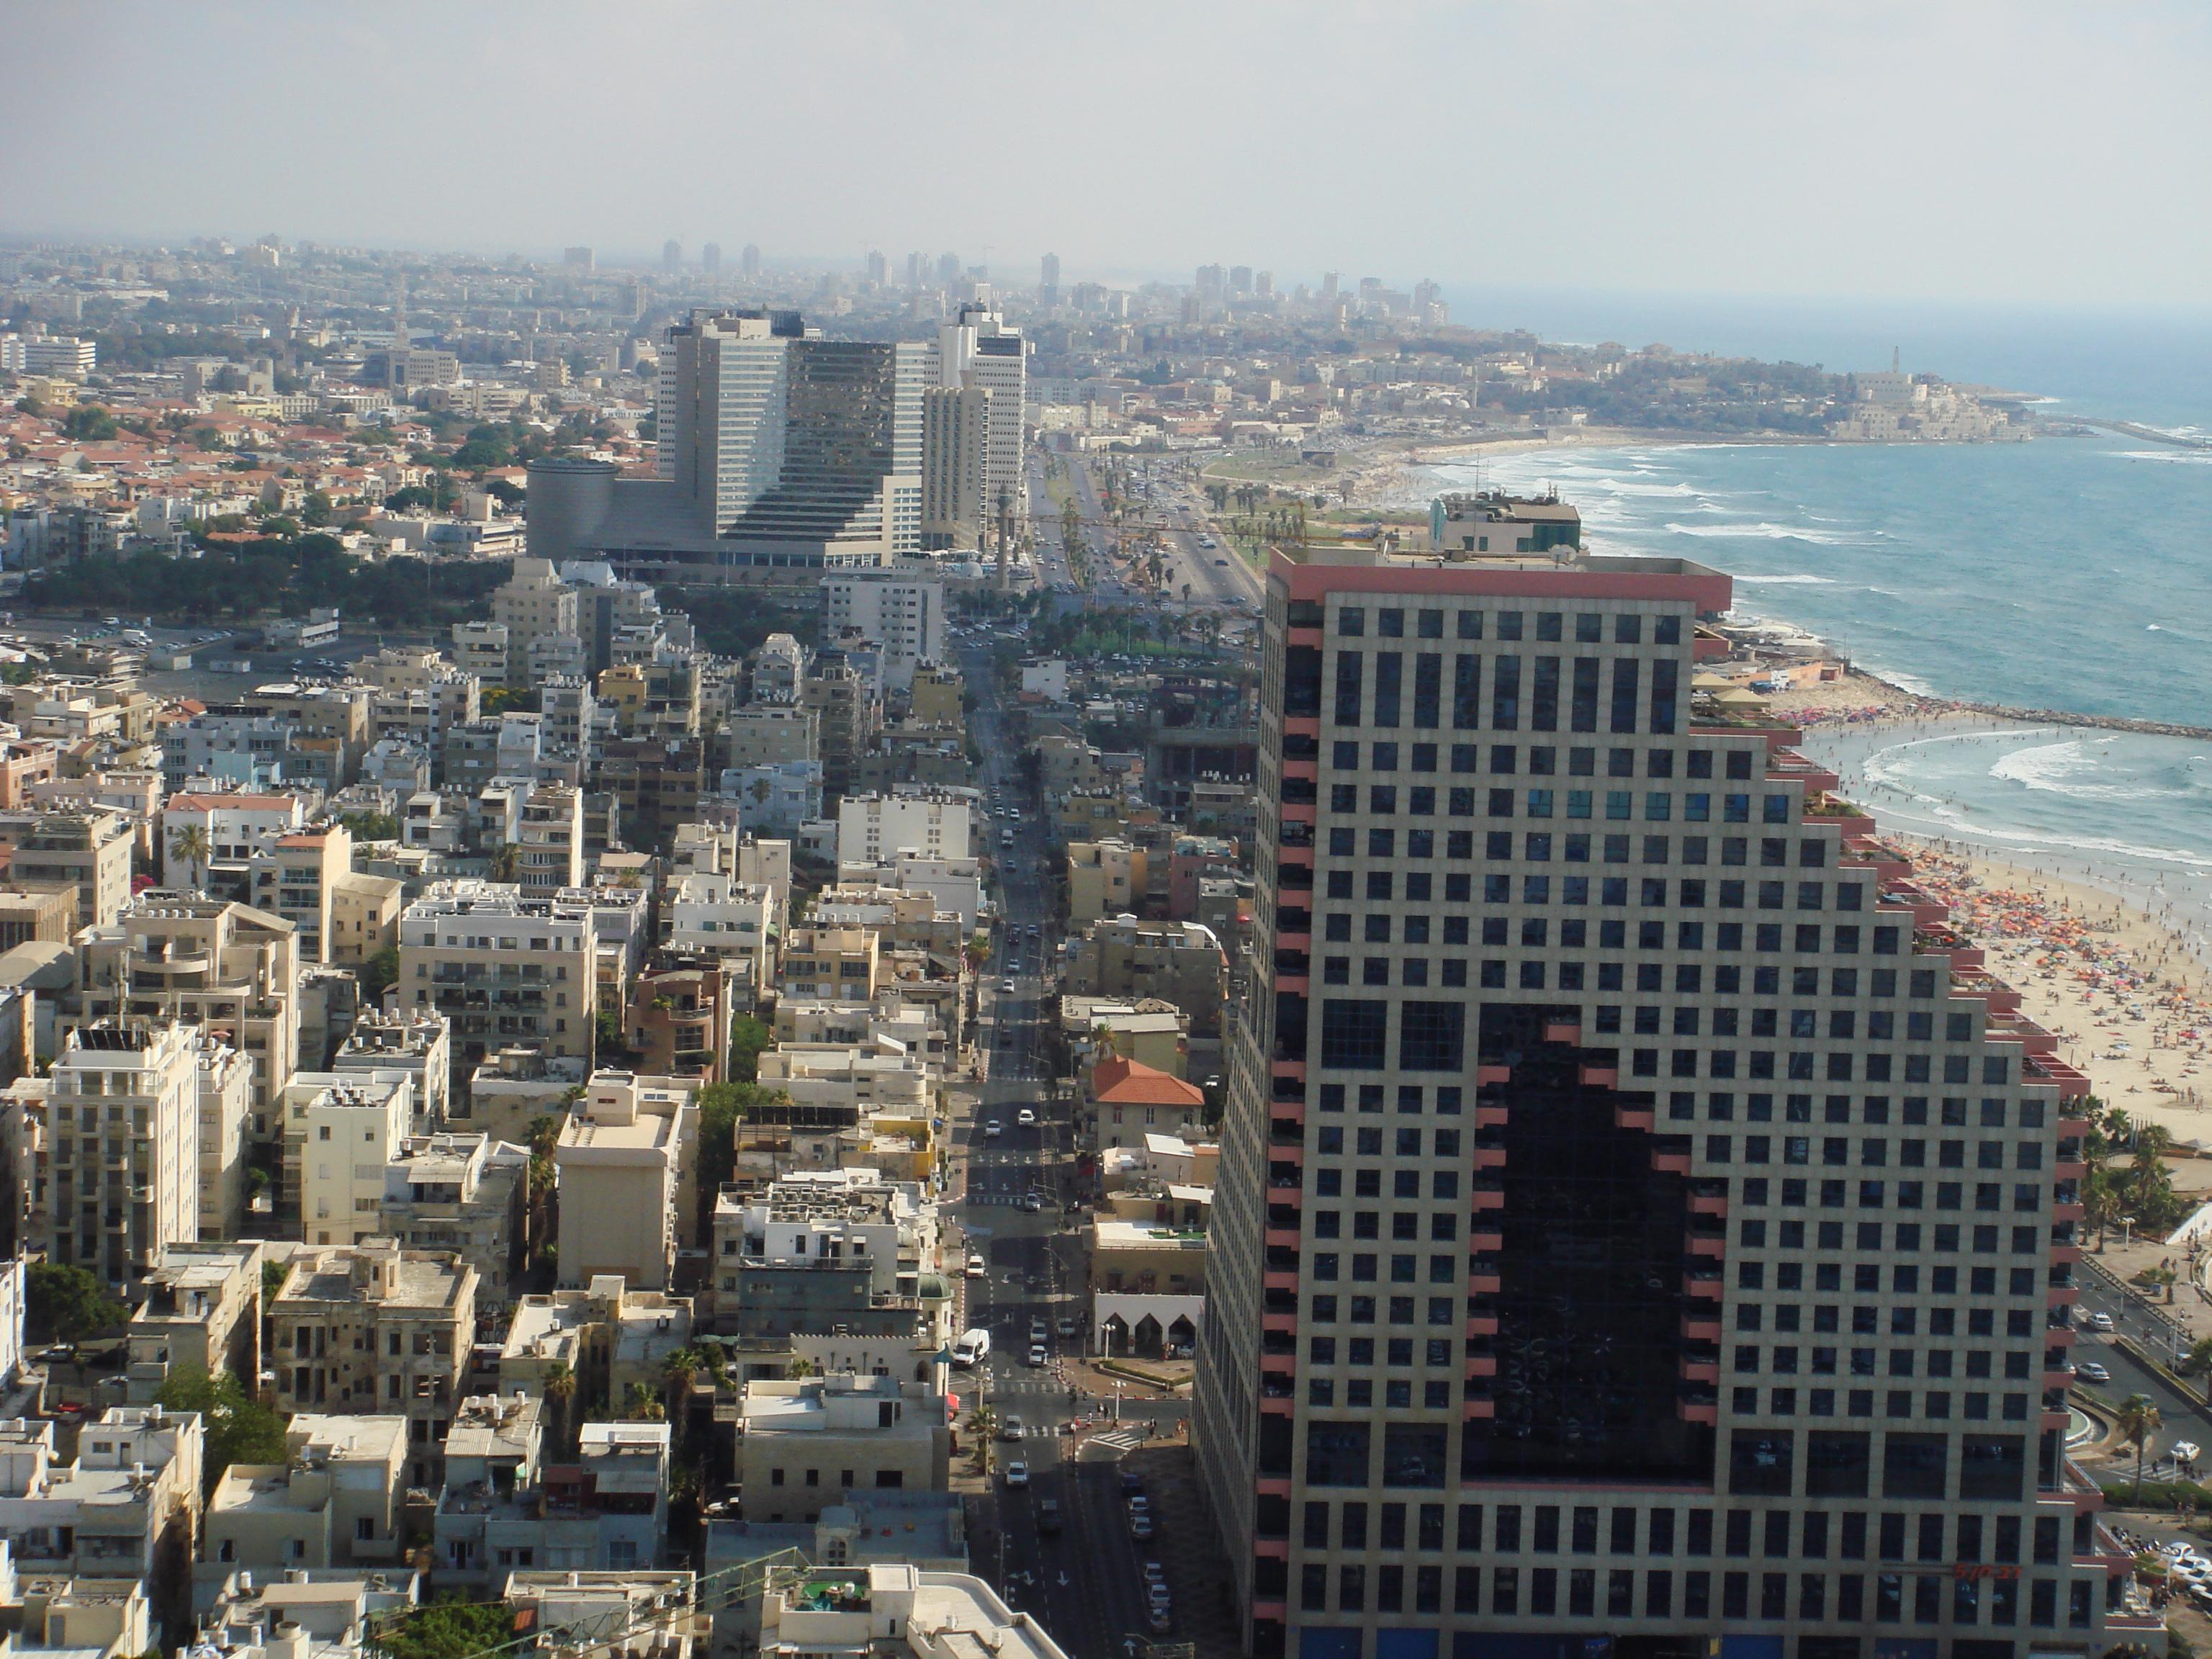 Tel Aviv southwards, Jaffa promontory